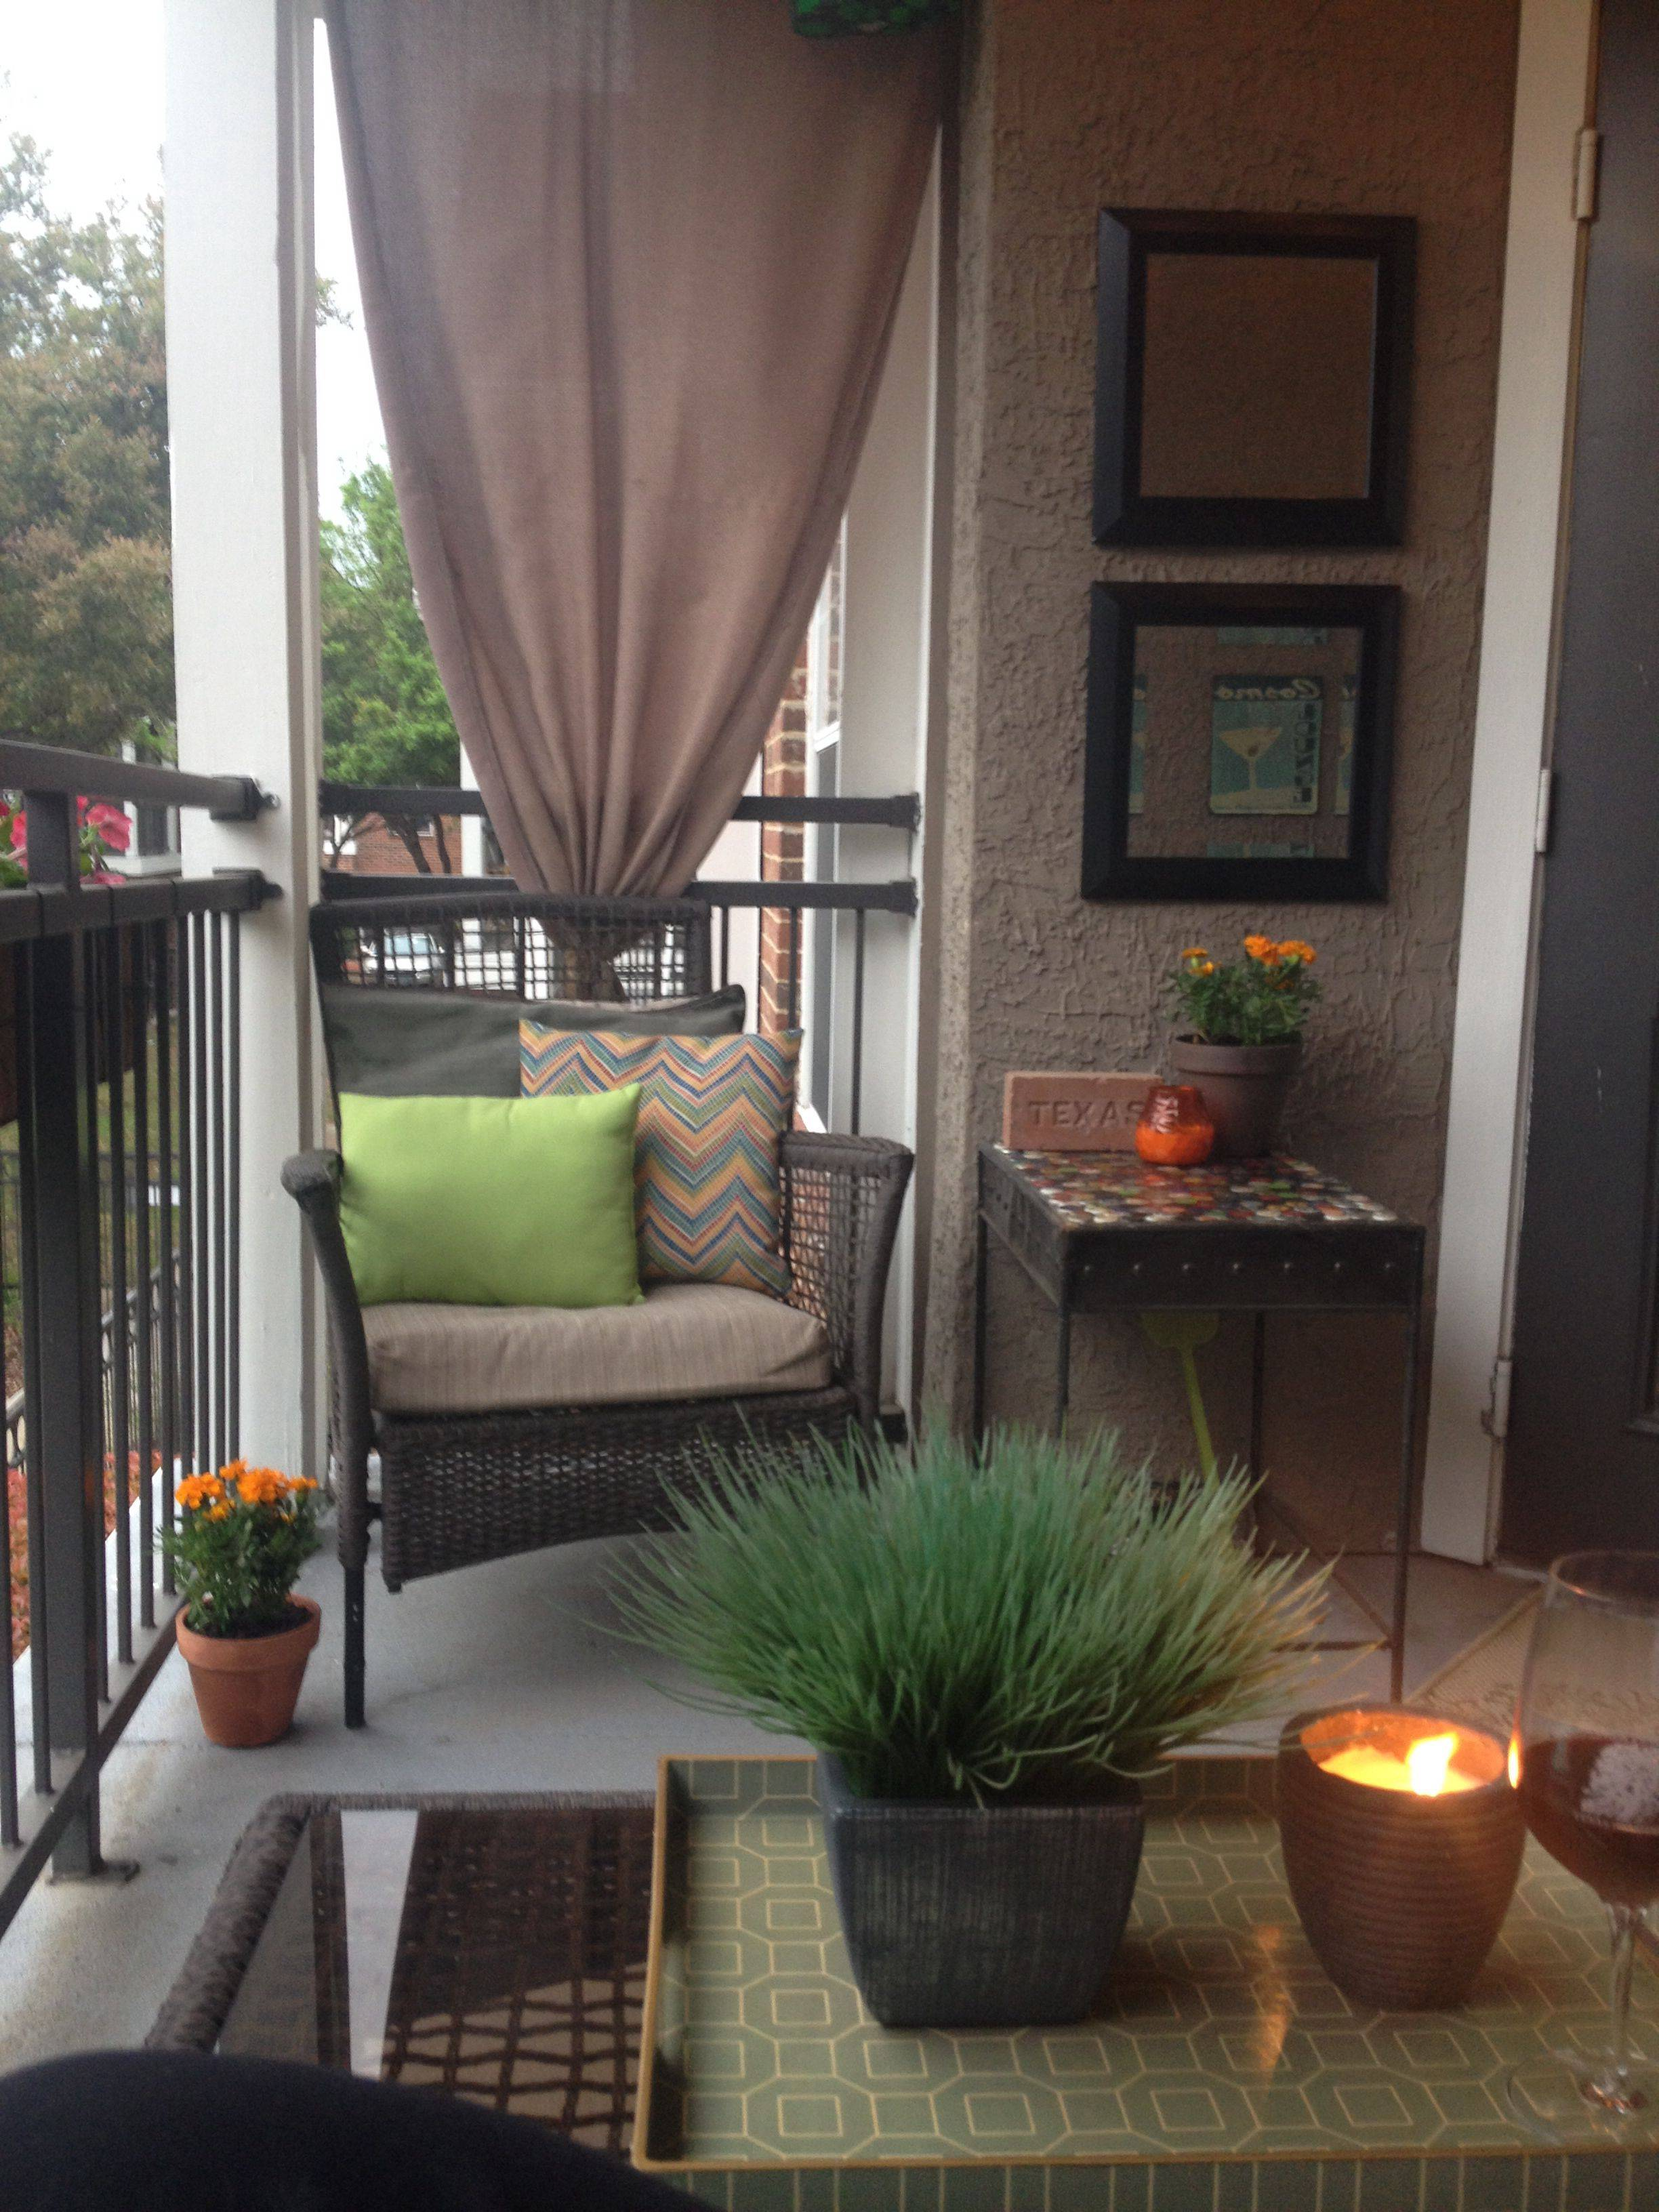 small apartment patio ideas pinterest fresh patio apartment patio patio decor jardin of small apartment patio ideas pinterest